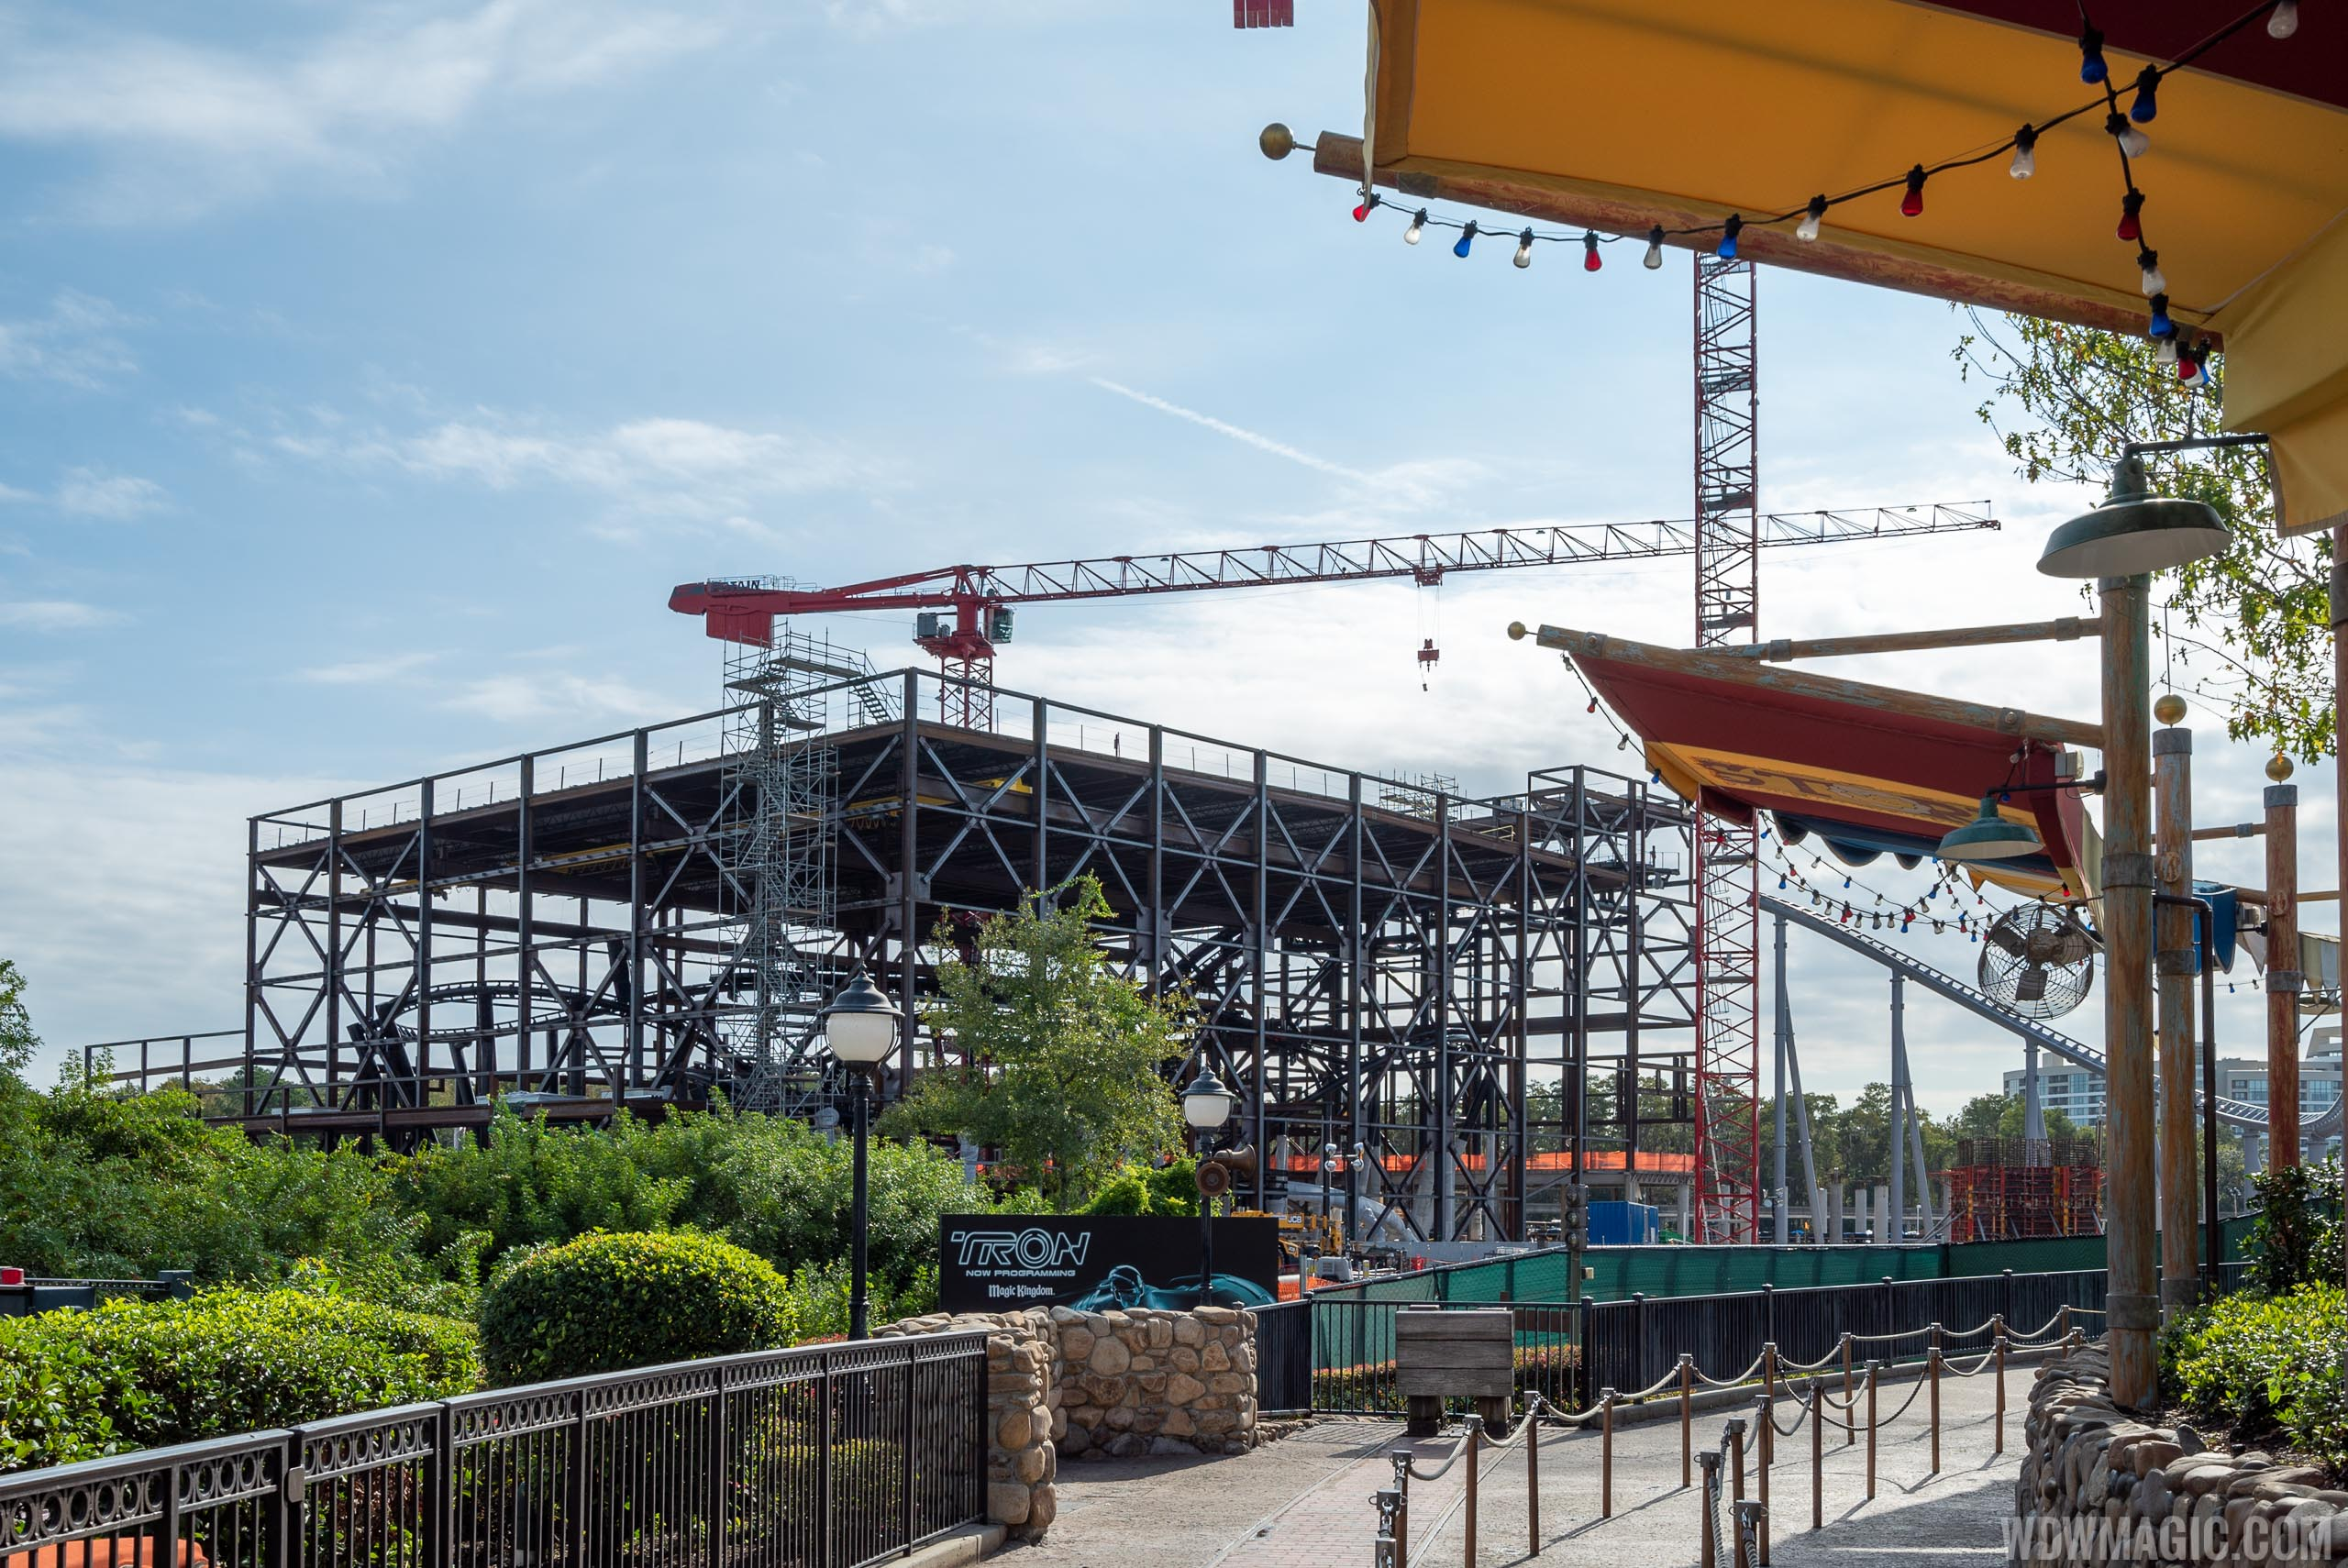 TRON Lightcycle Run construction site - November 2019